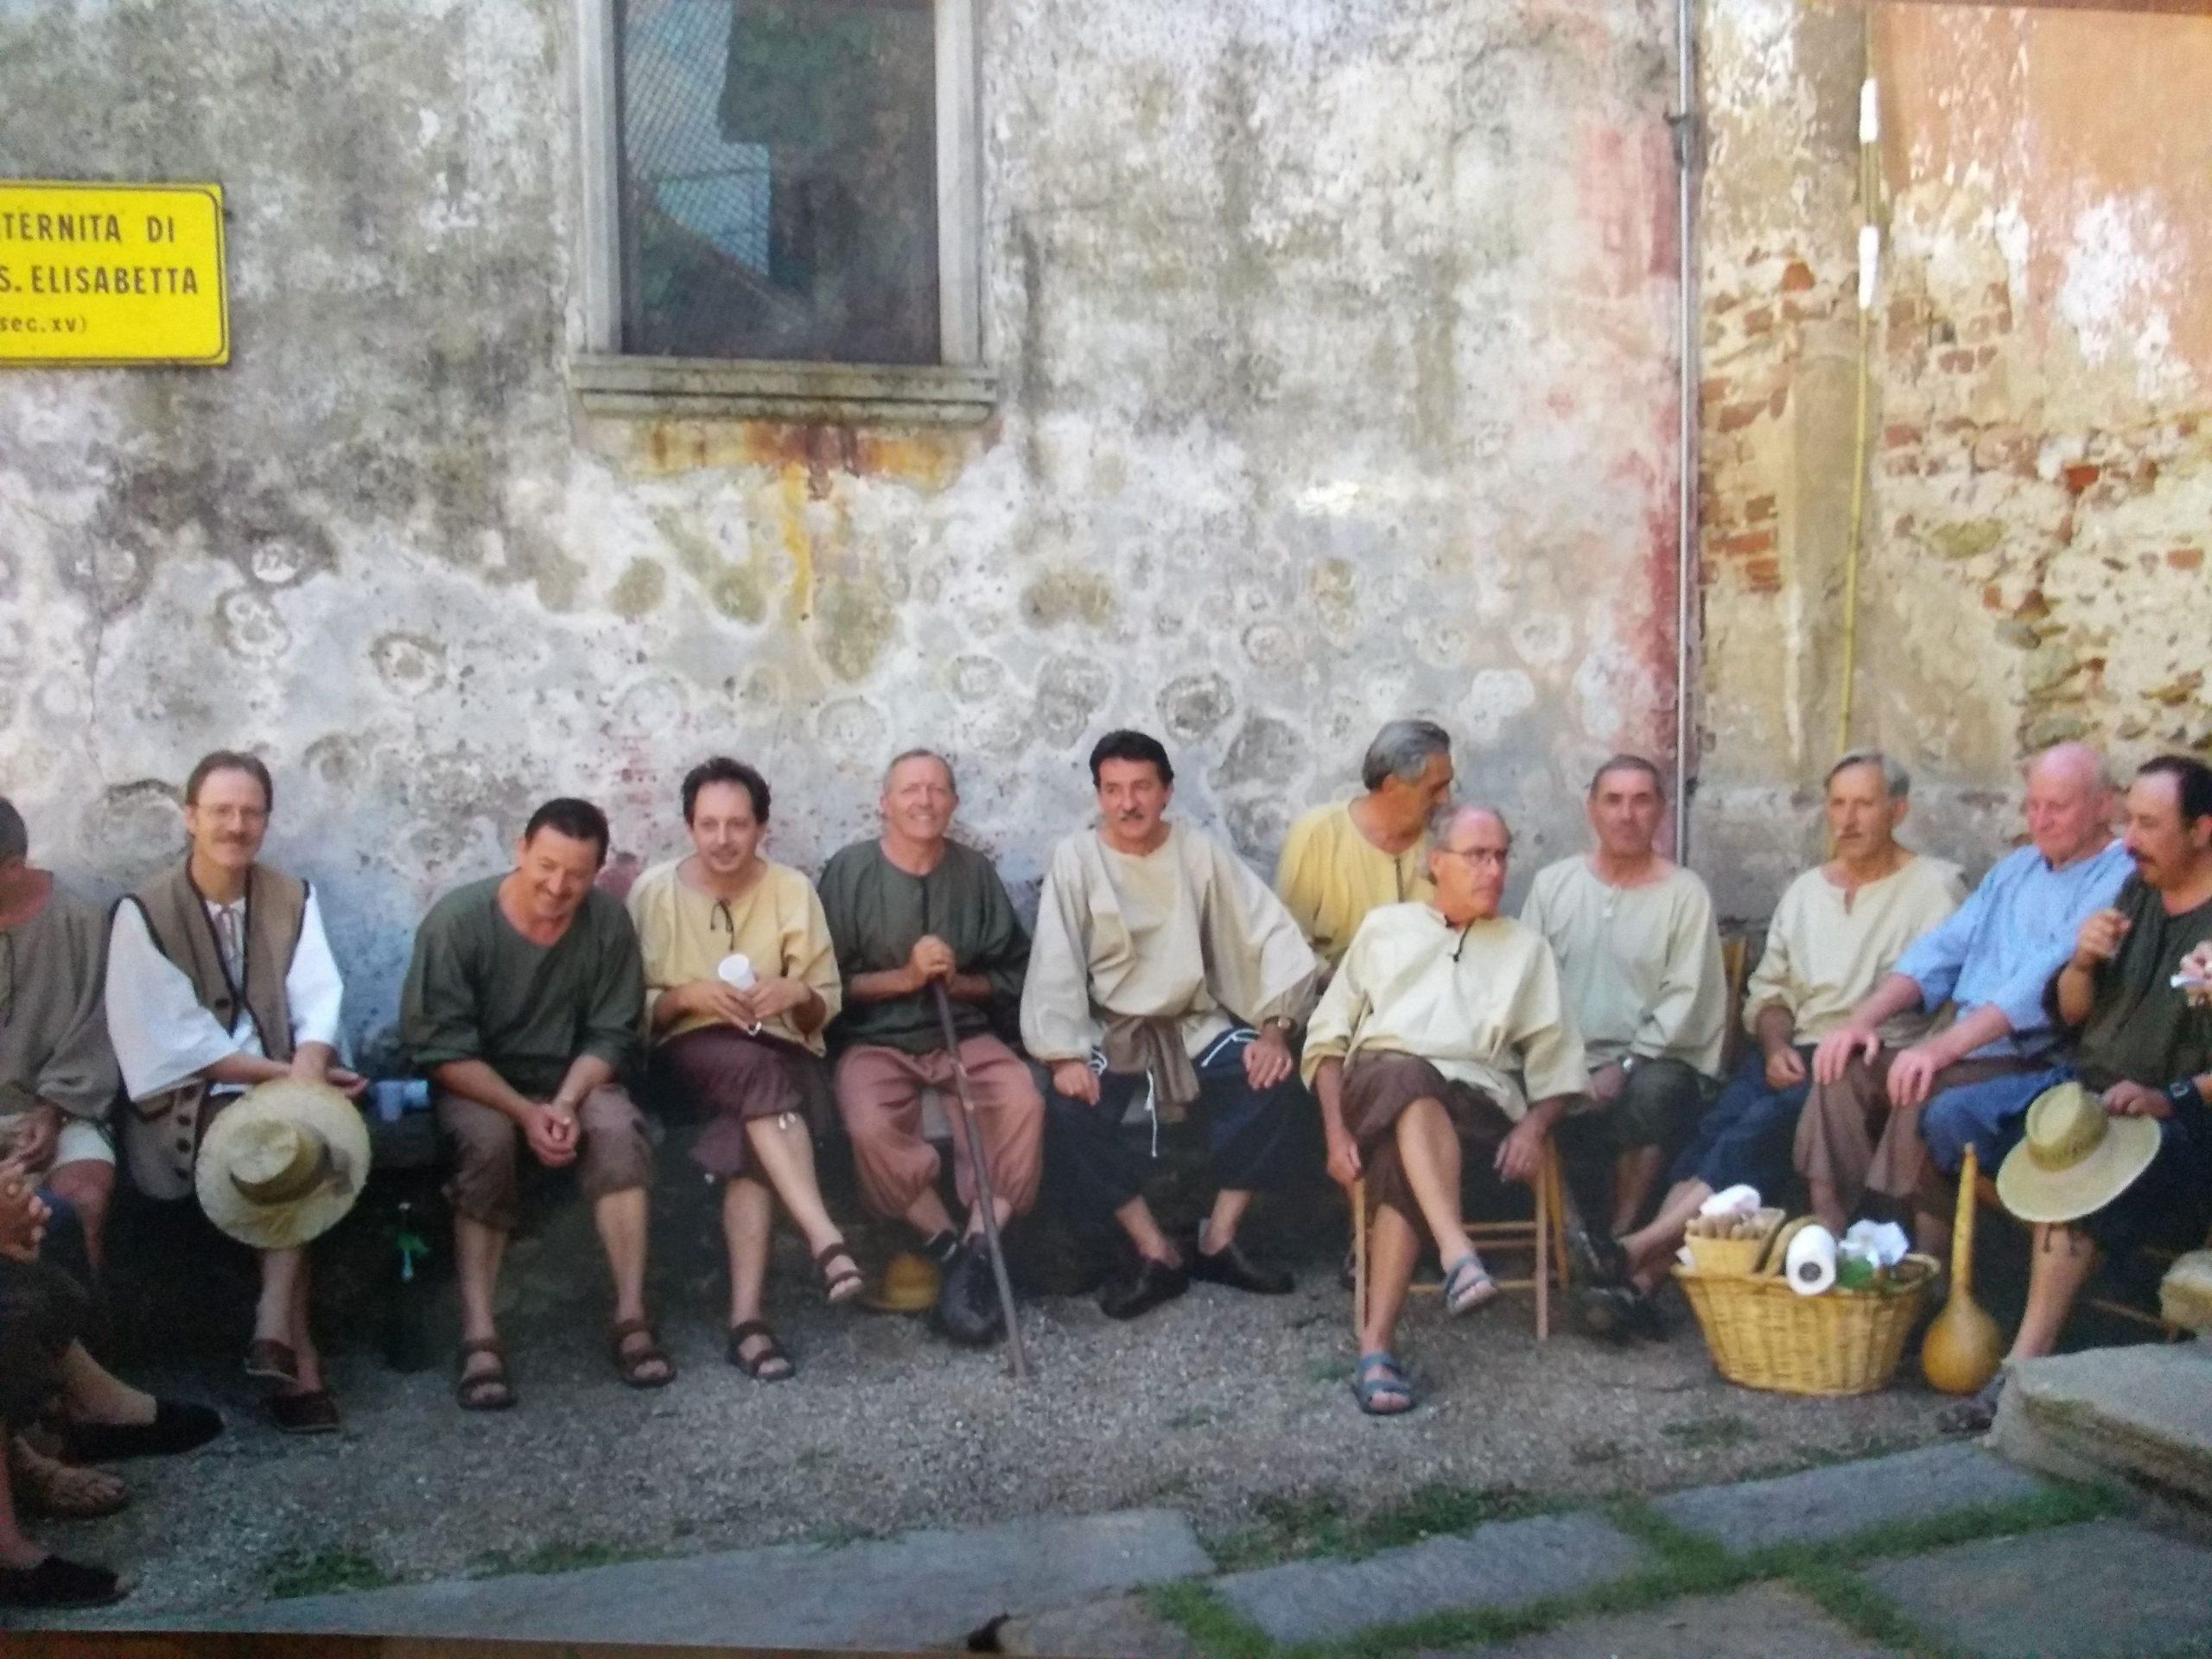 Piemonteses - Portada